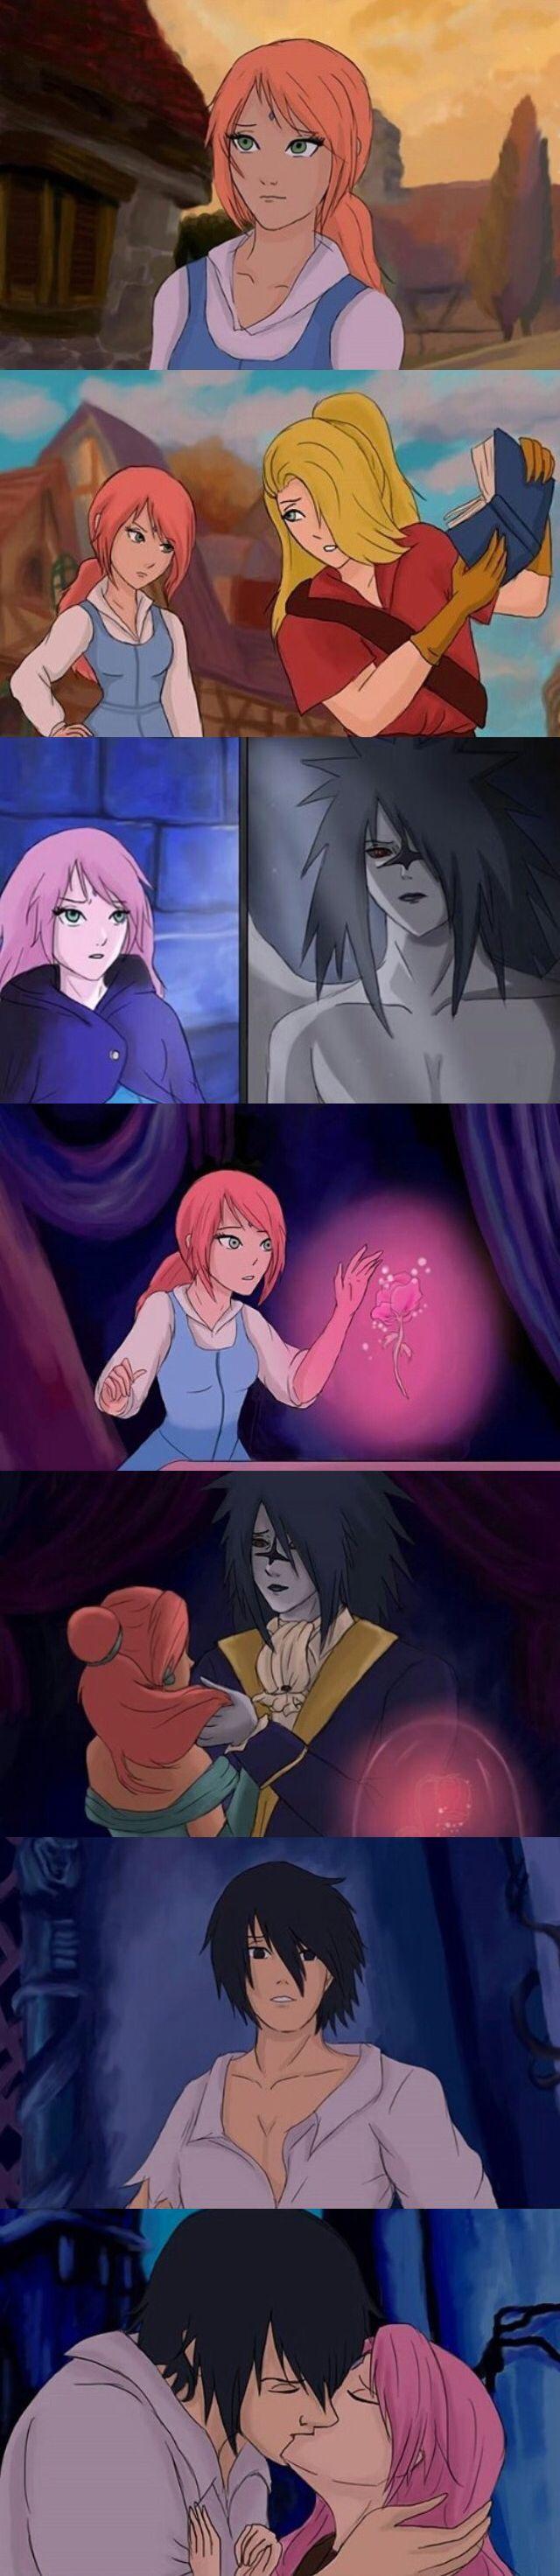 Sasusaku and Beauty and the Beast, MY FAVORITES